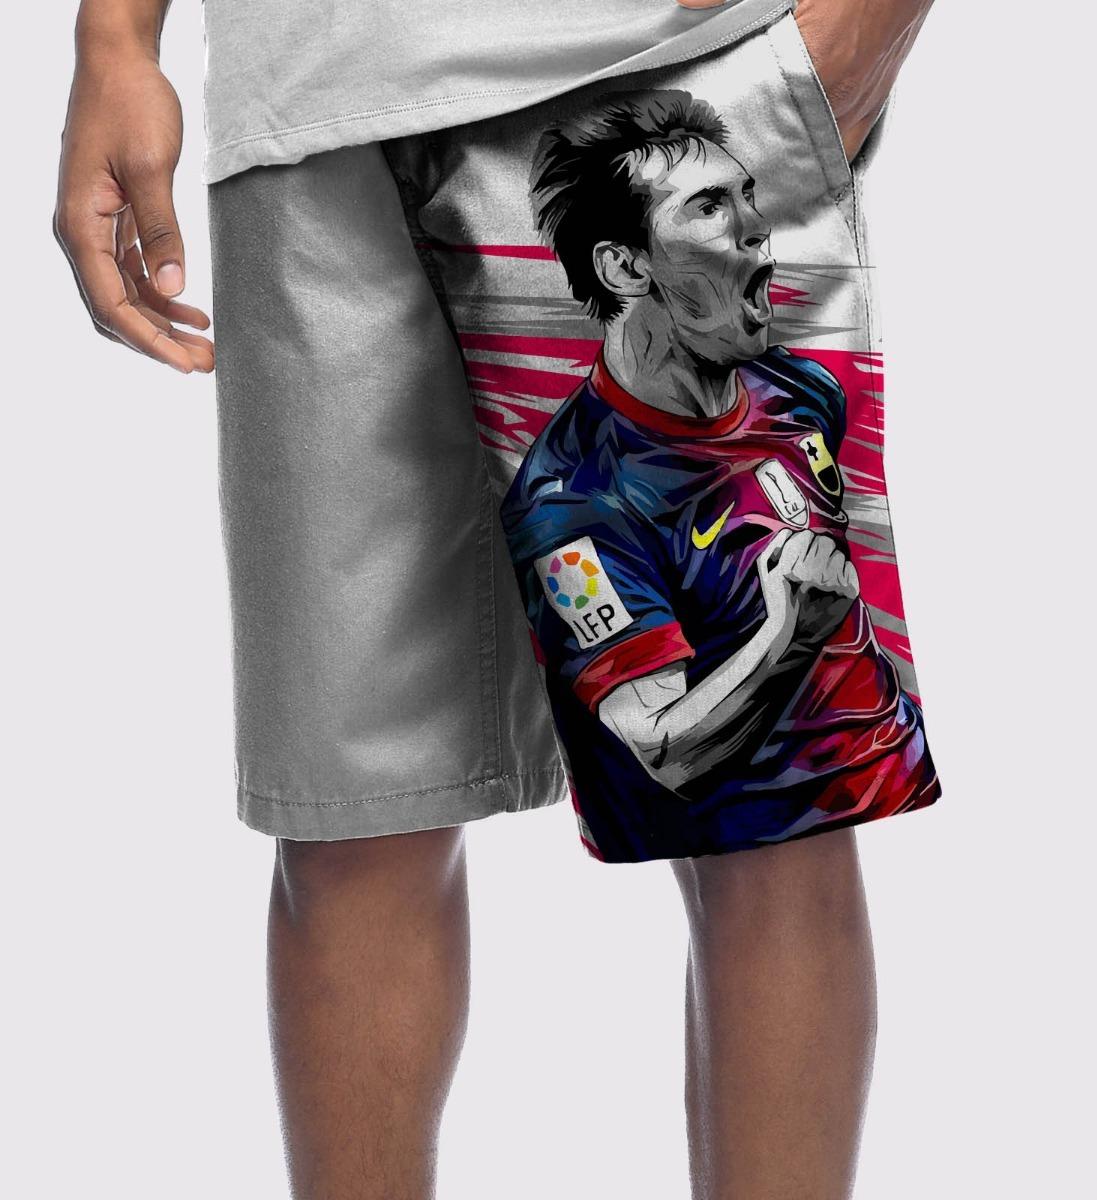 b9cbc41f20377 Bermuda Microfibra Futebol Soccer Messi Barcelona Argentina - R  149 ...